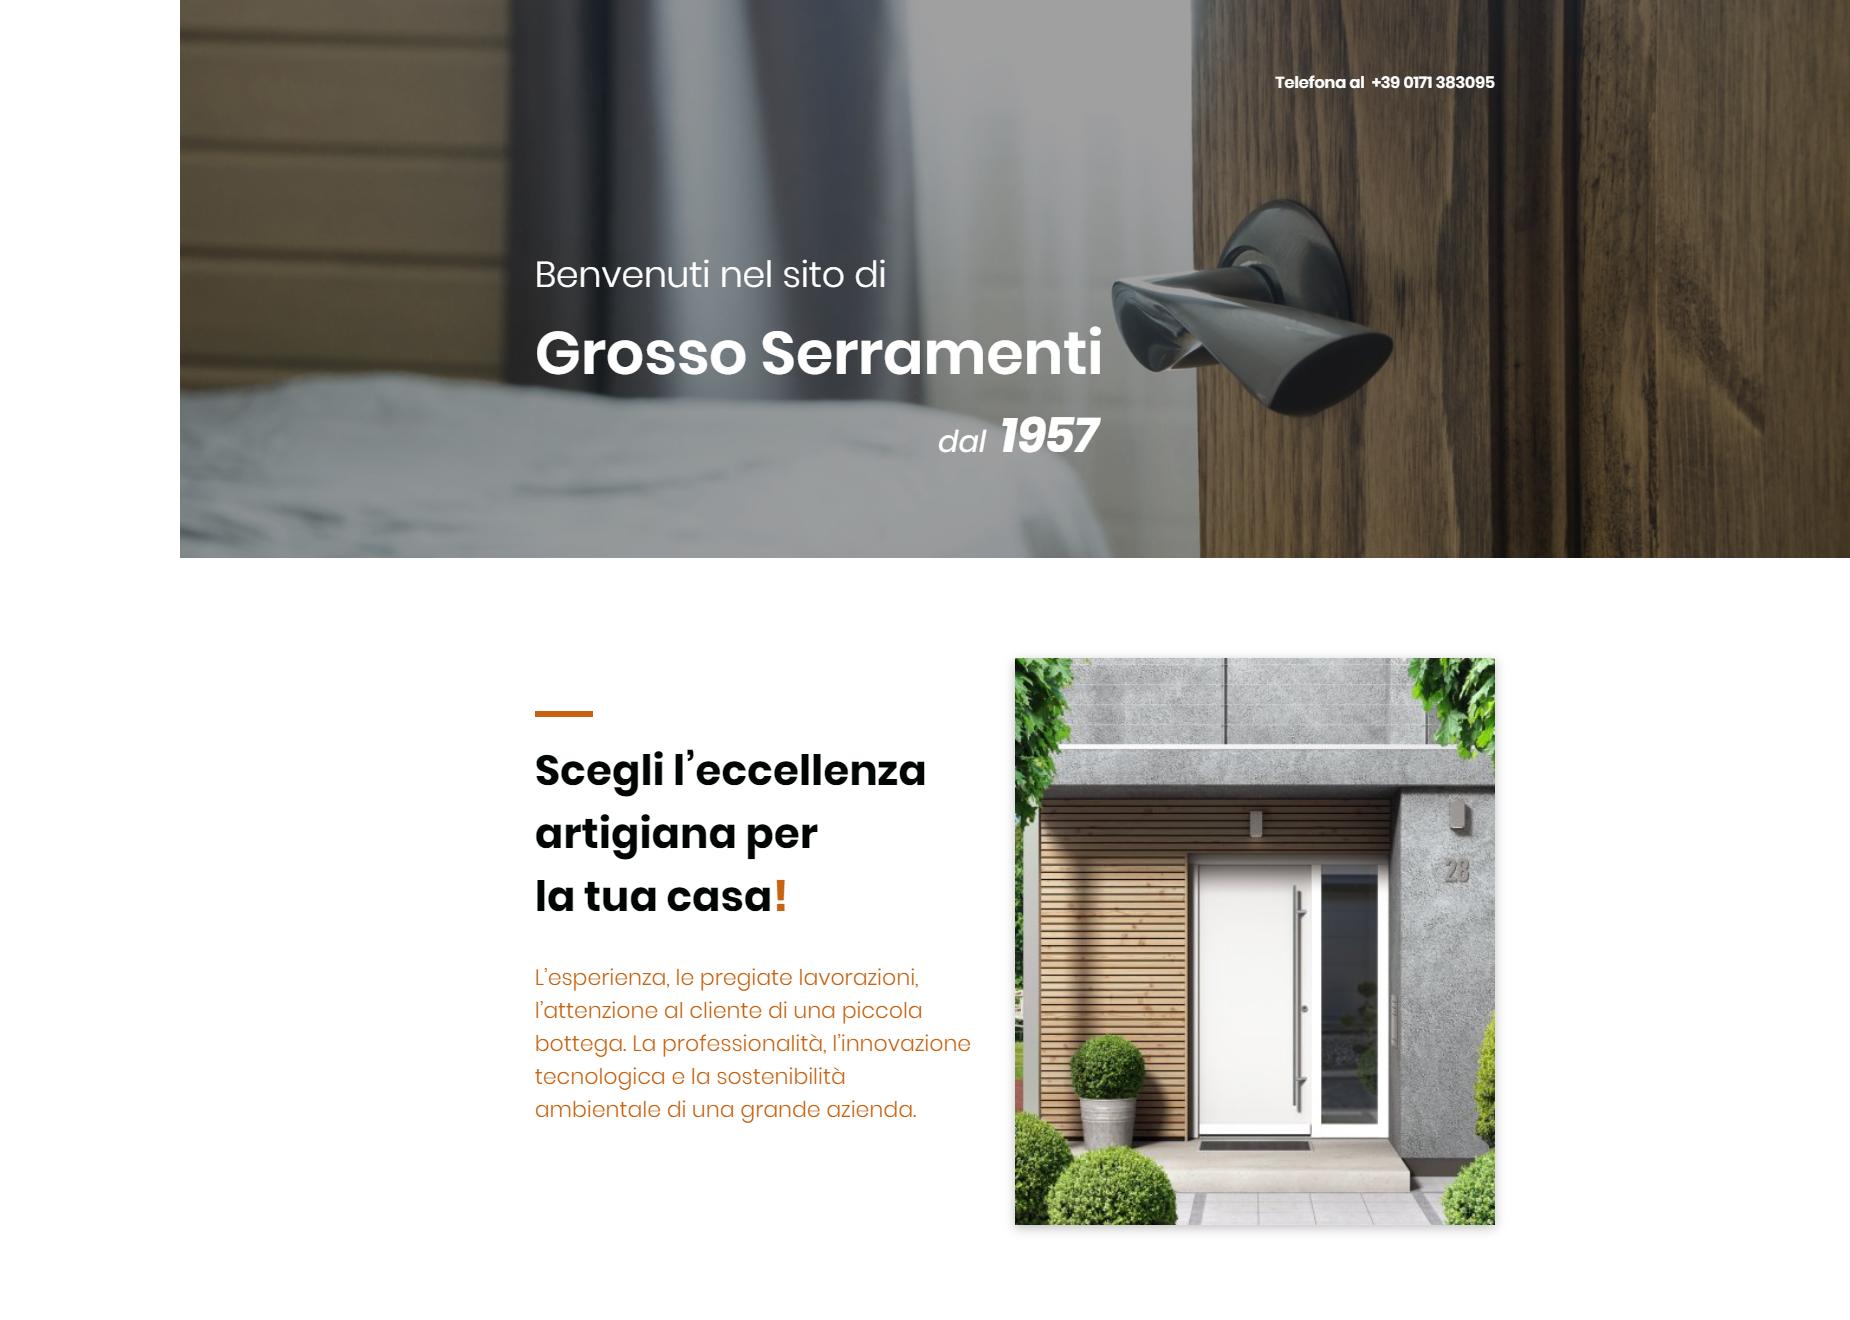 screencapture-grossoserramenti-it-2020-02-17-14_32_13 (1)